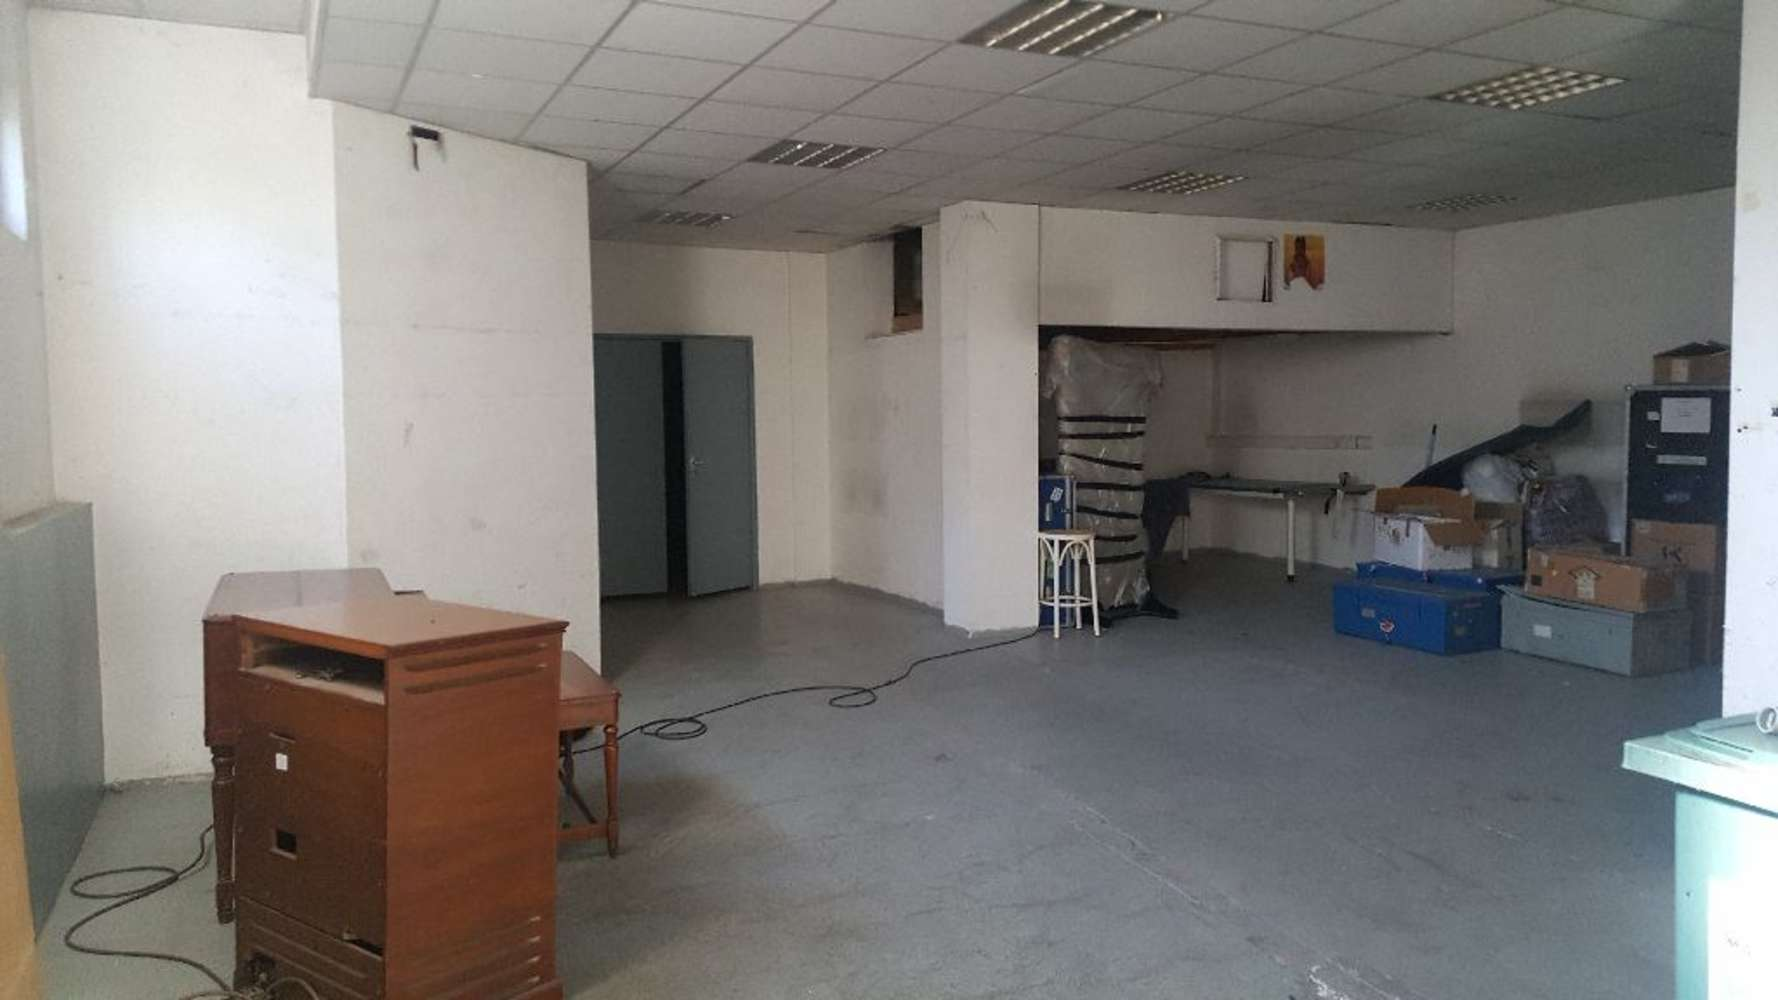 Activités/entrepôt Malakoff, 92240 - 35BIS RUE DE LA TOUR - 9607696